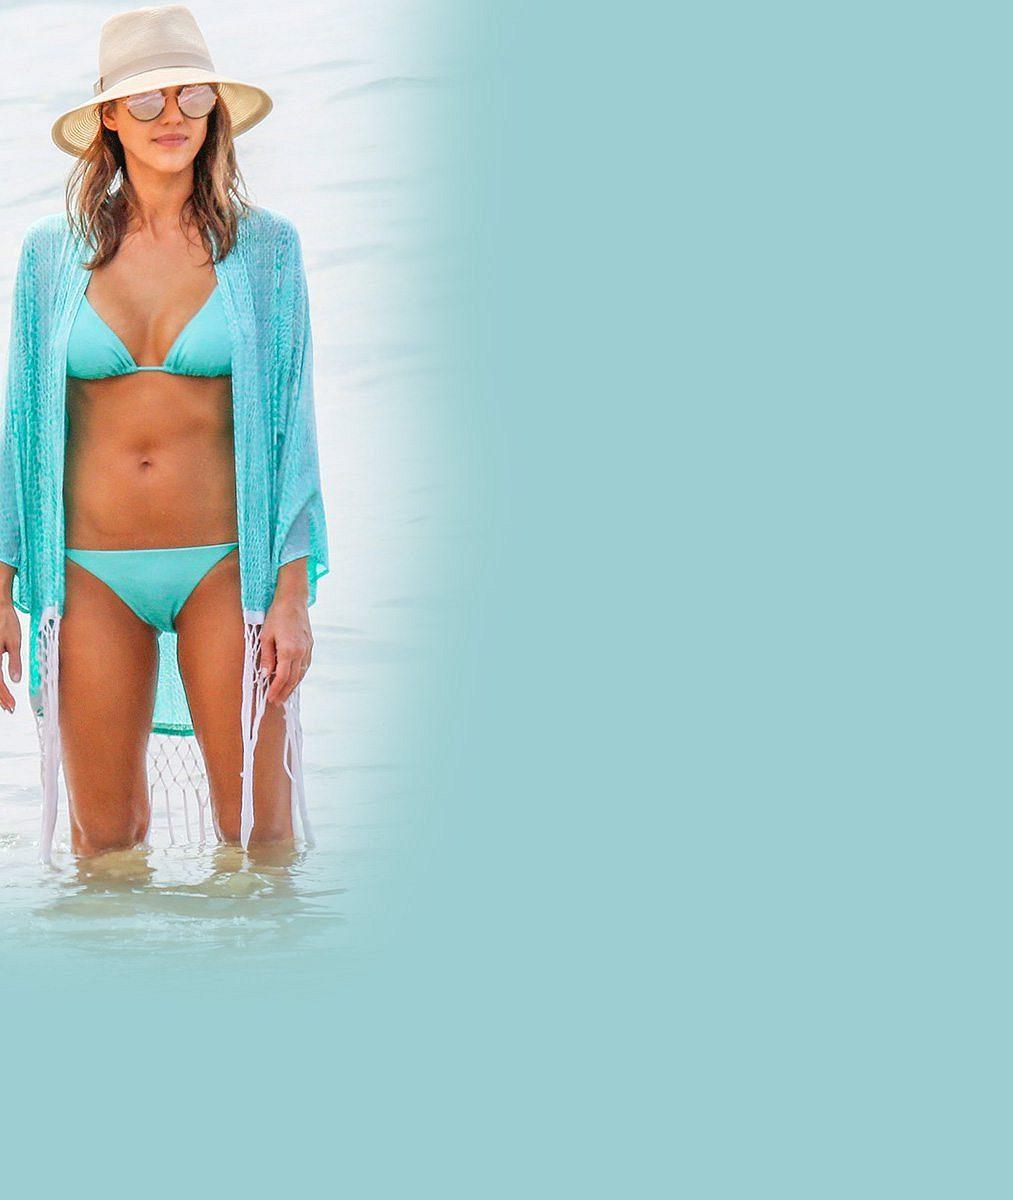 Pořád je to špica: Striptérka ze Sin City Jessica Alba vnebeských bikinách na Maui